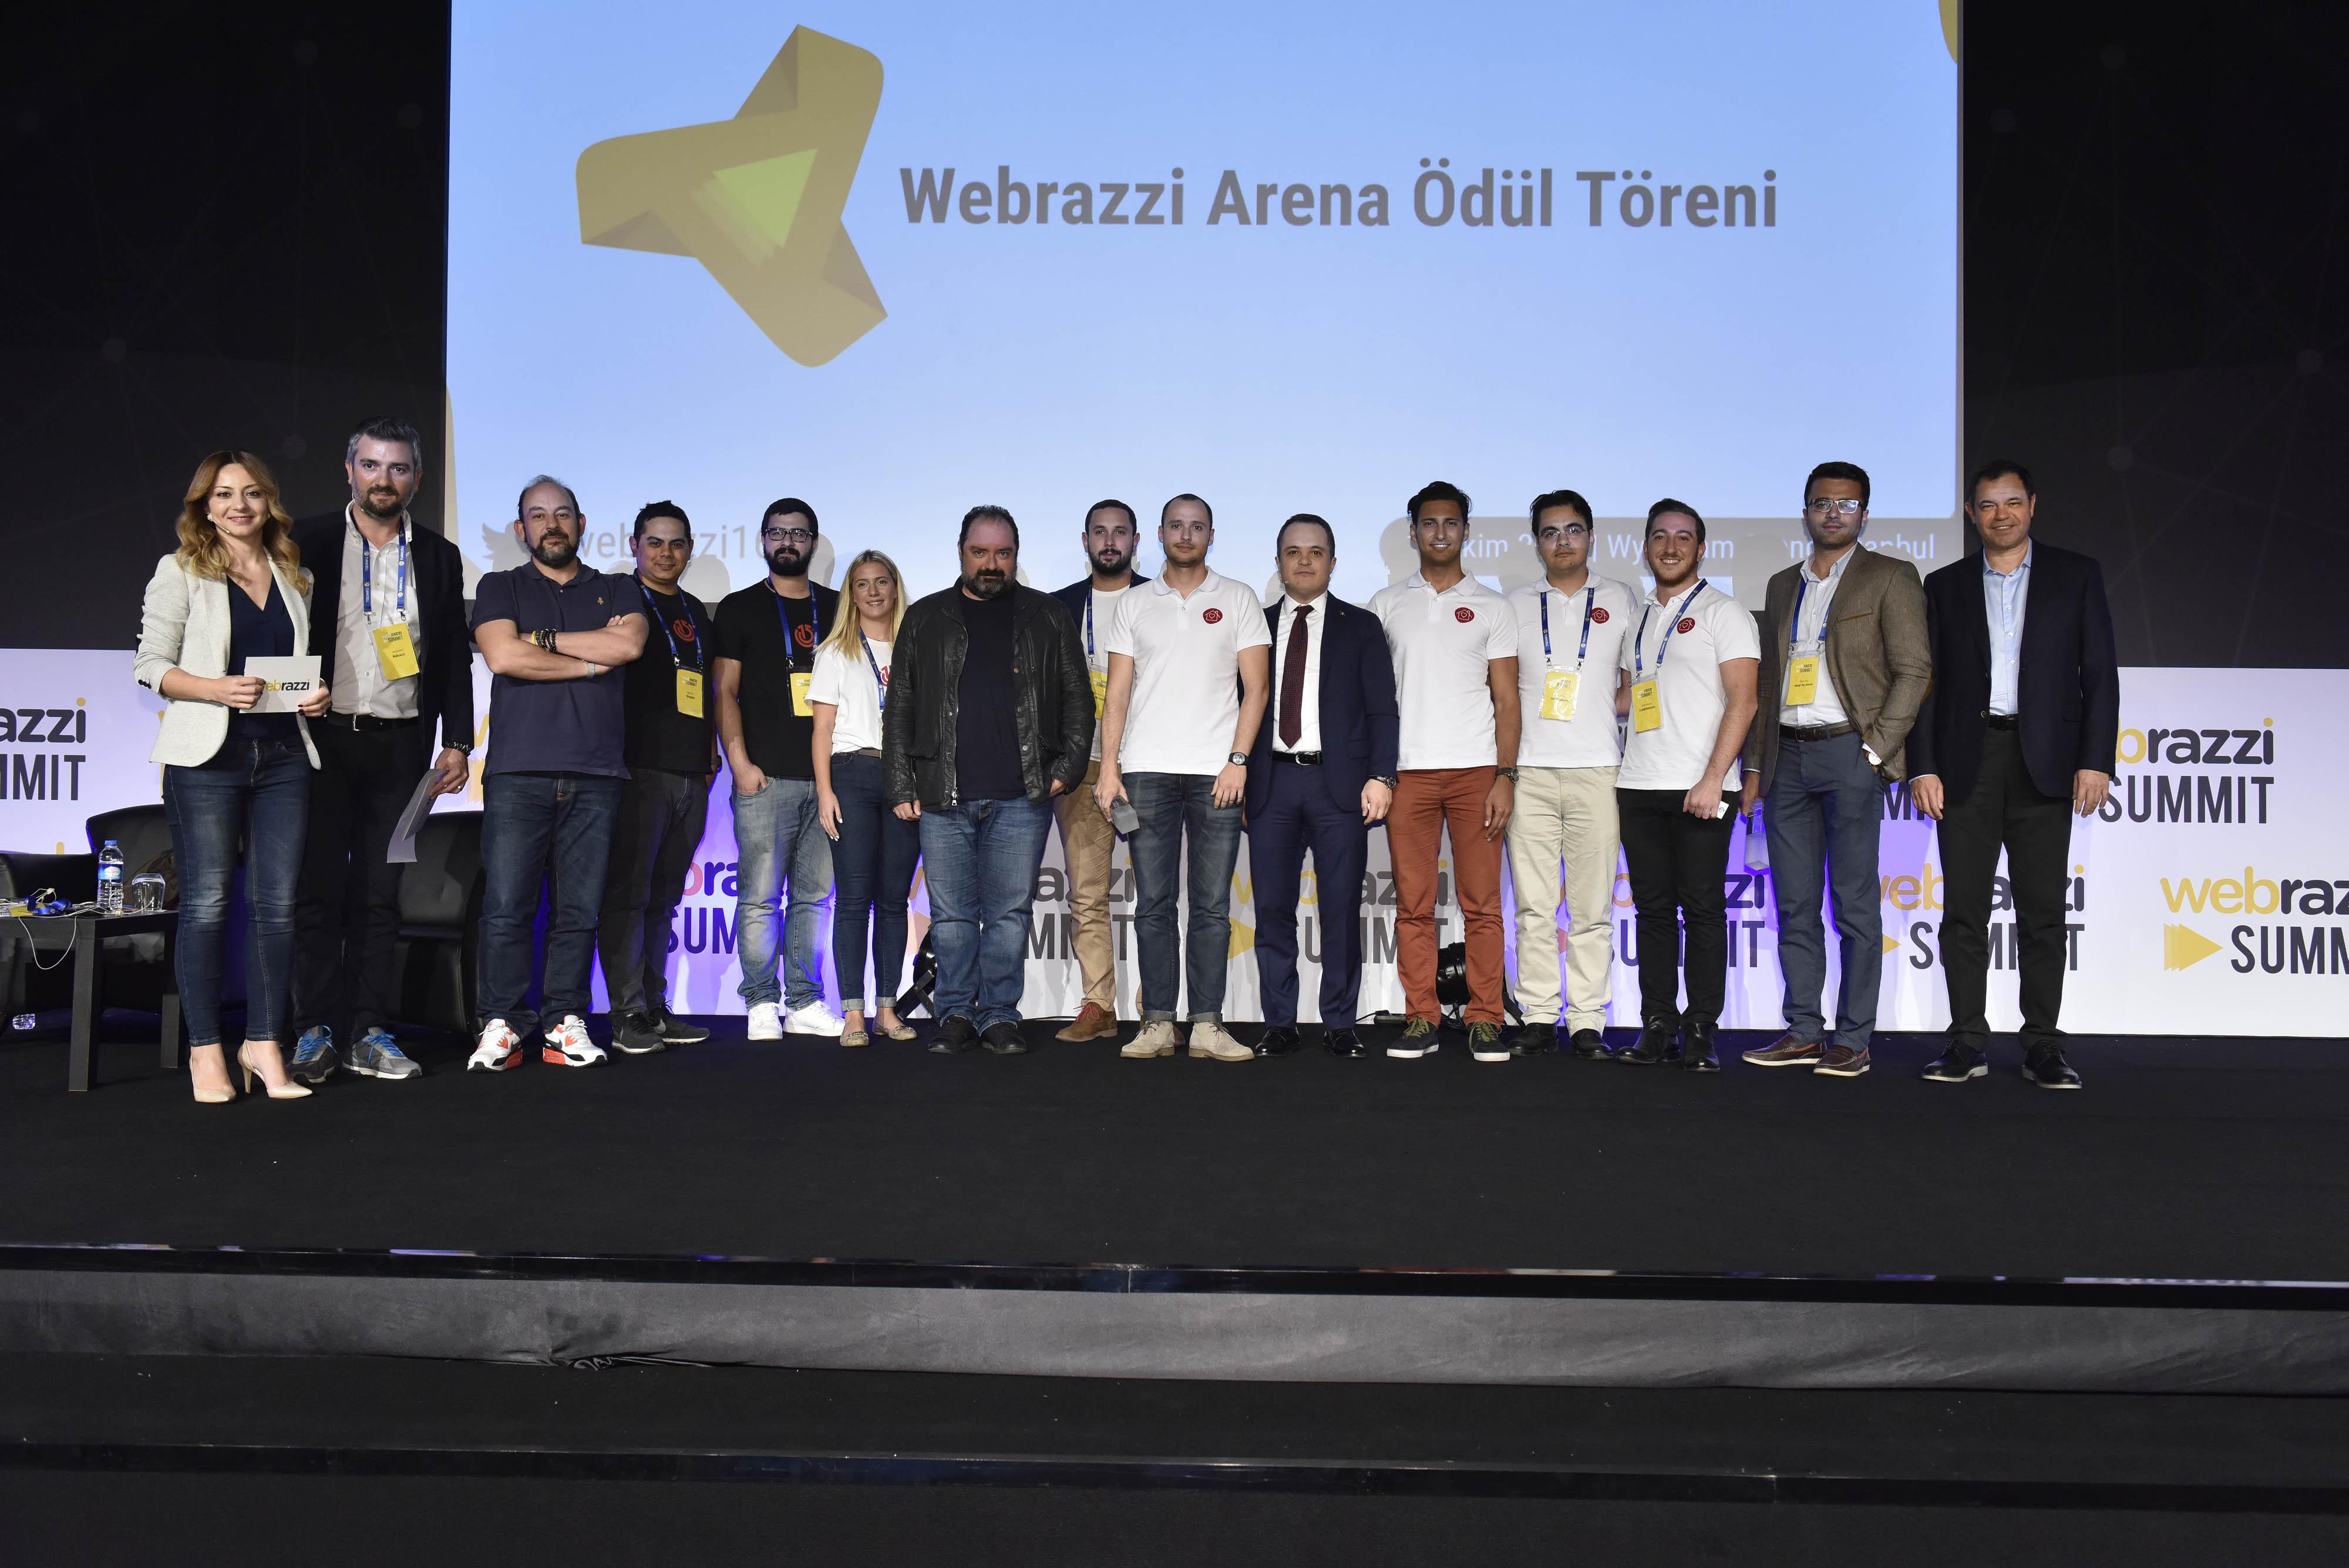 webrazzi-arena-2016